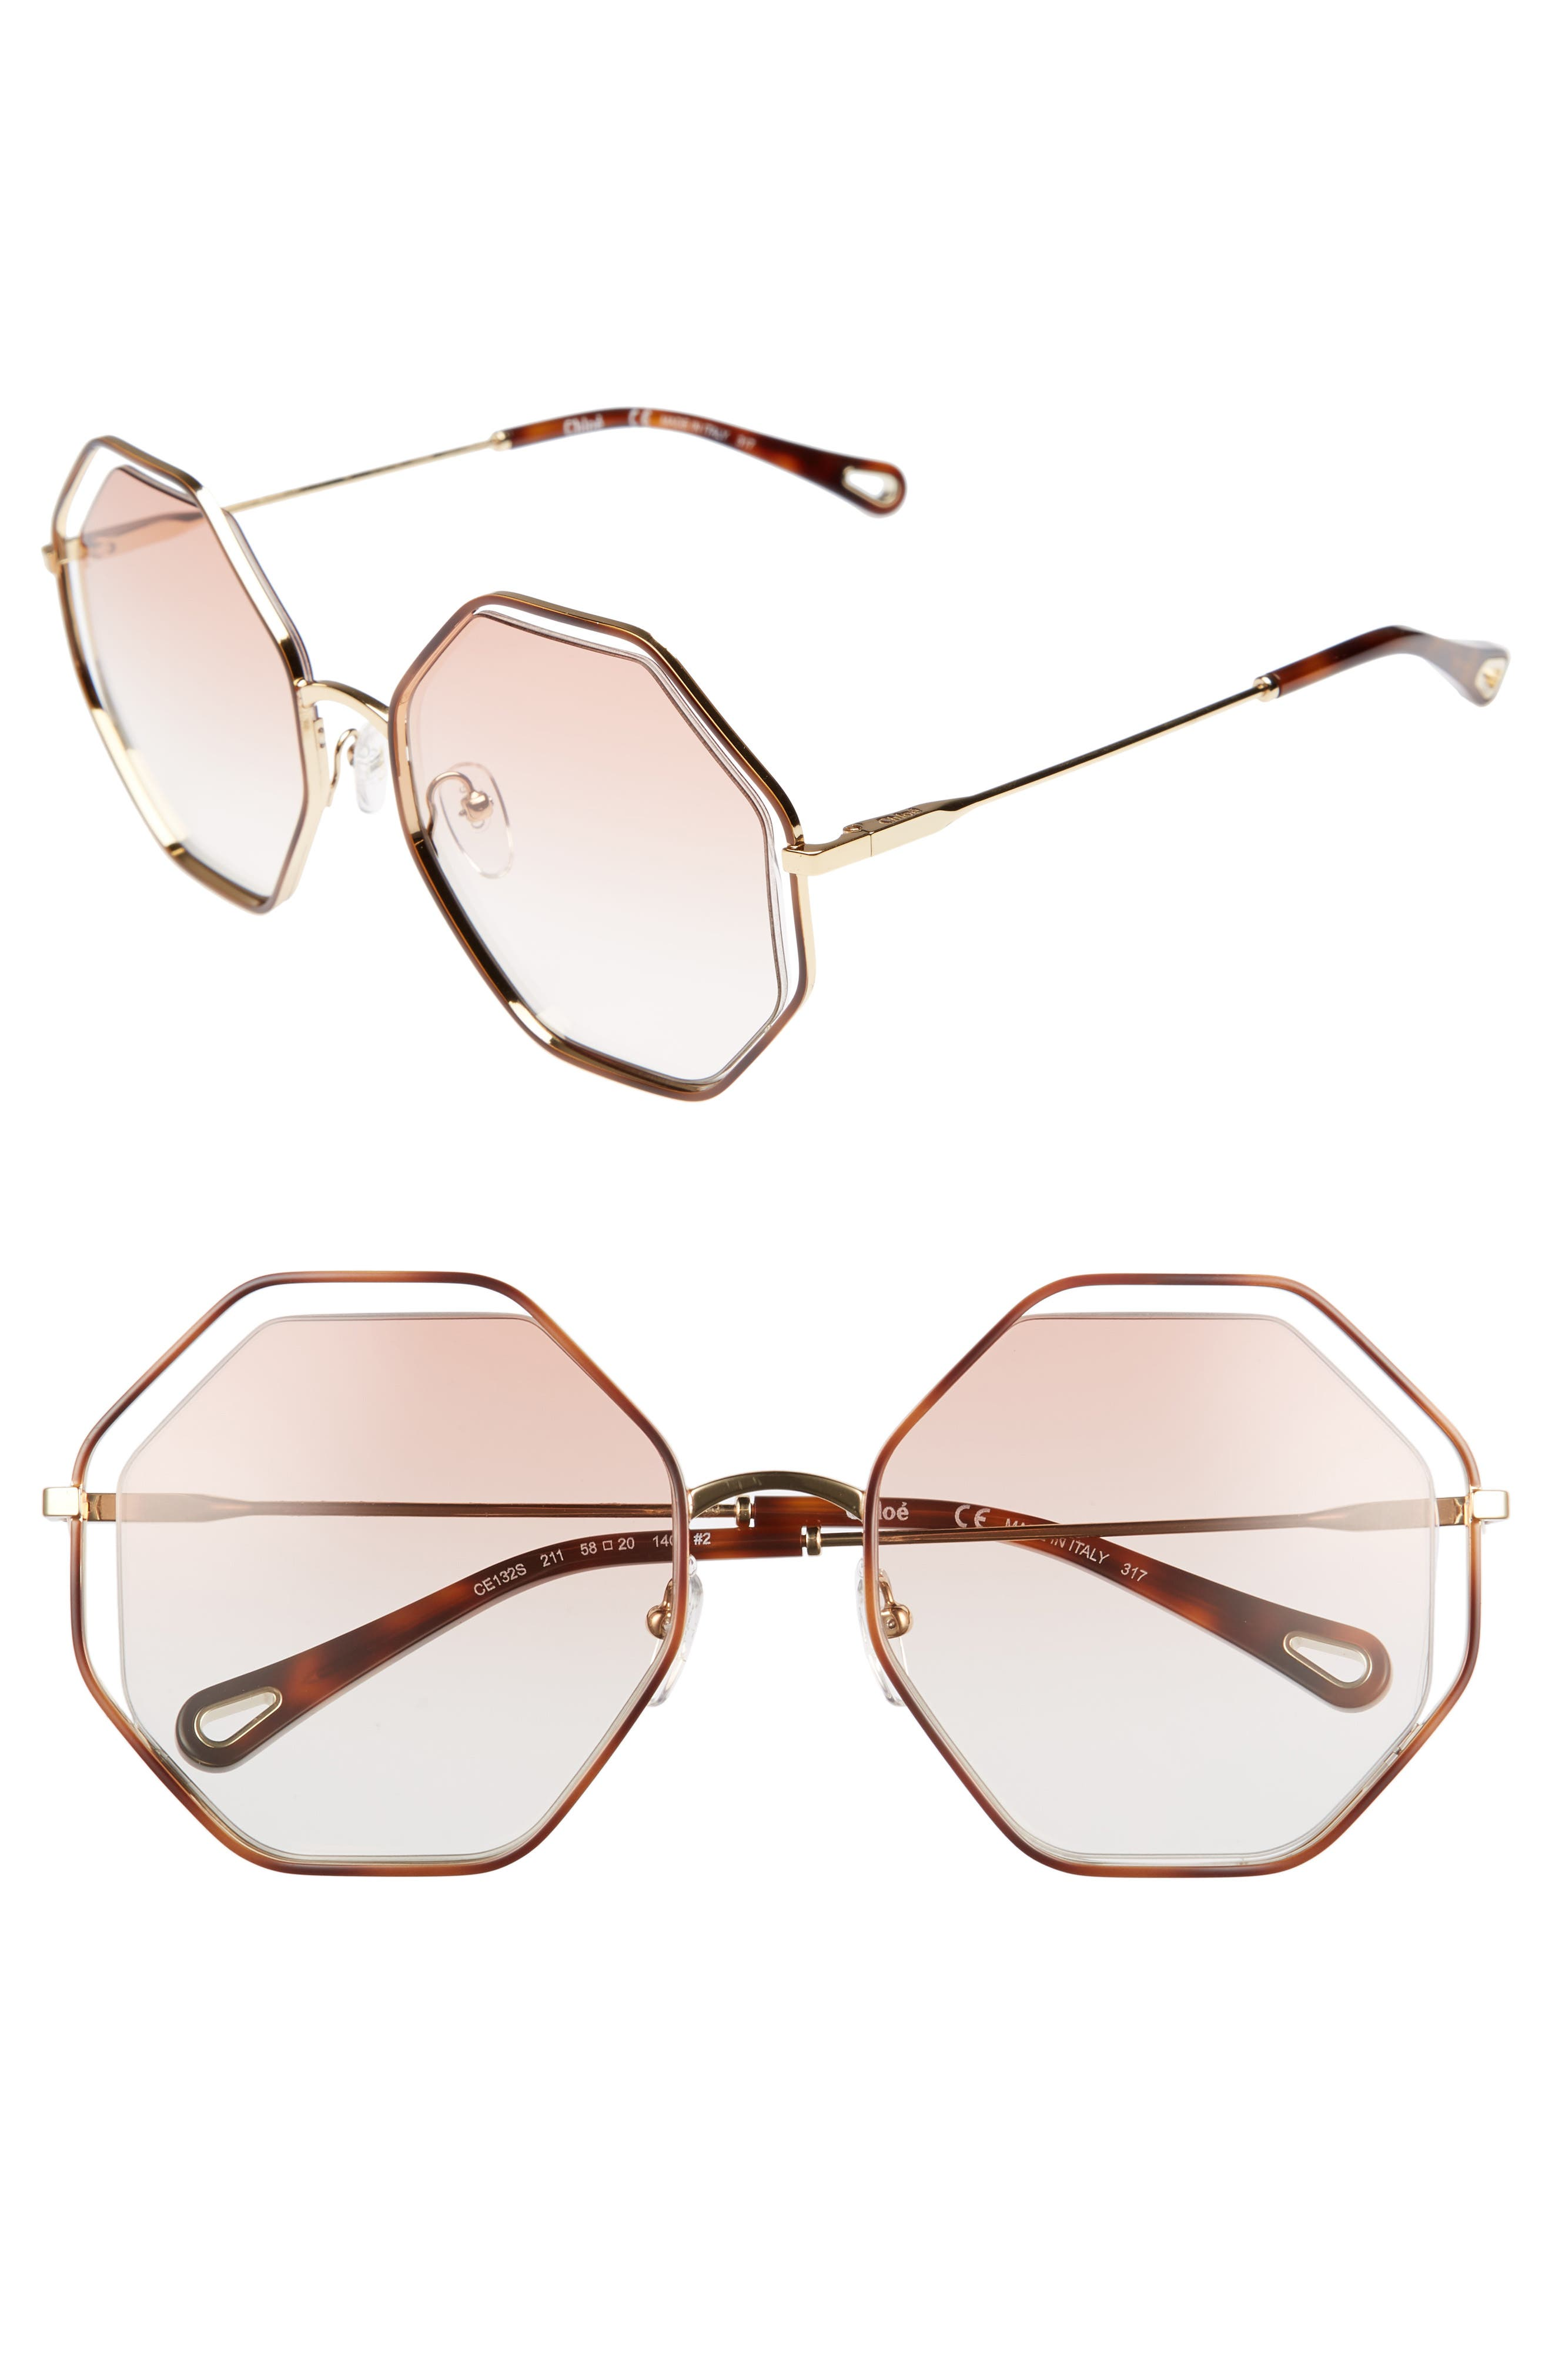 Chloe 5m Octagonal Halo Lens Sunglasses - Havana/ Peach